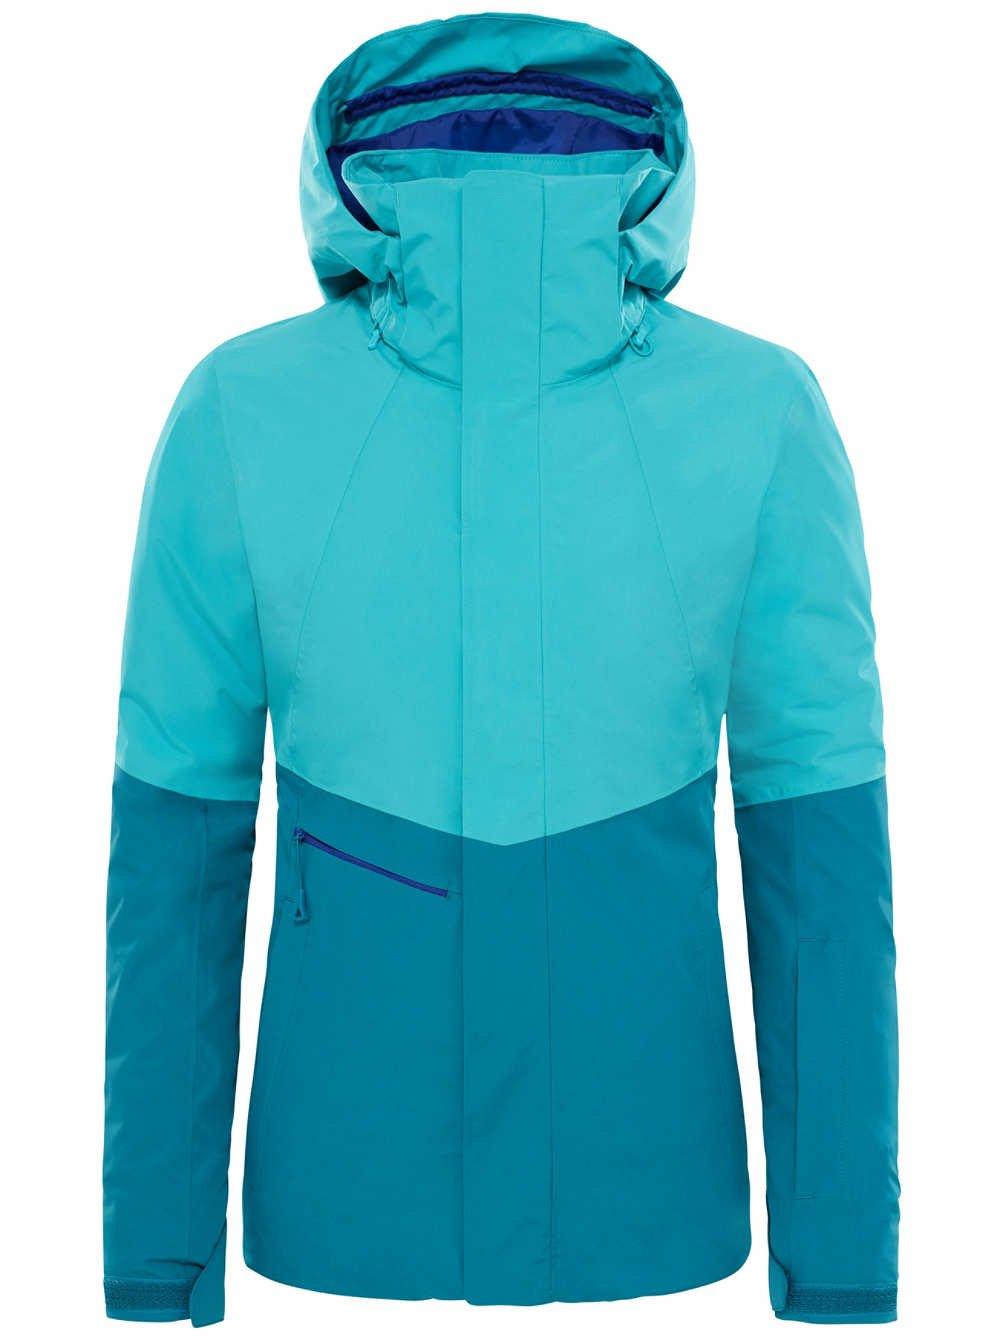 ad1b4a2a7 The North Face Women's Garner Triclimate Jacket 2018 Vistula Blue ...